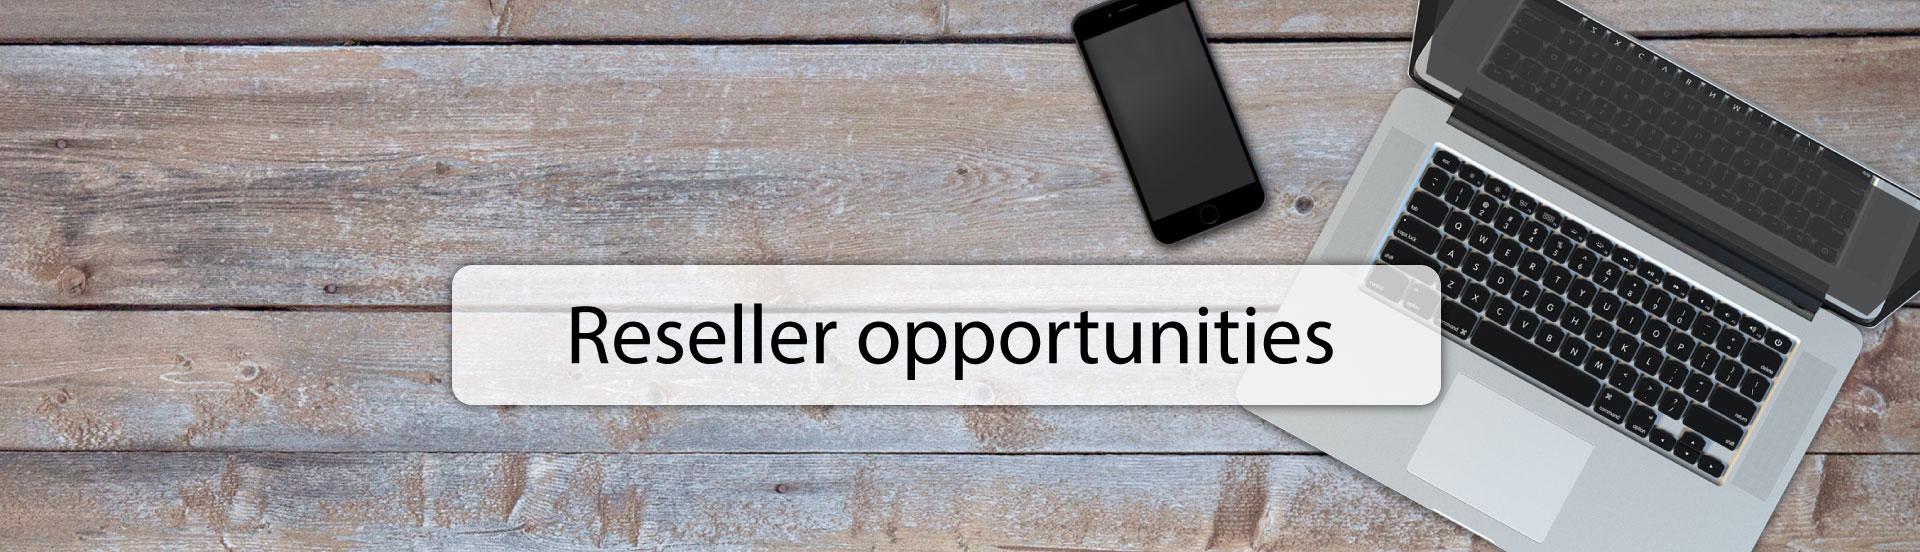 reseller opportunities